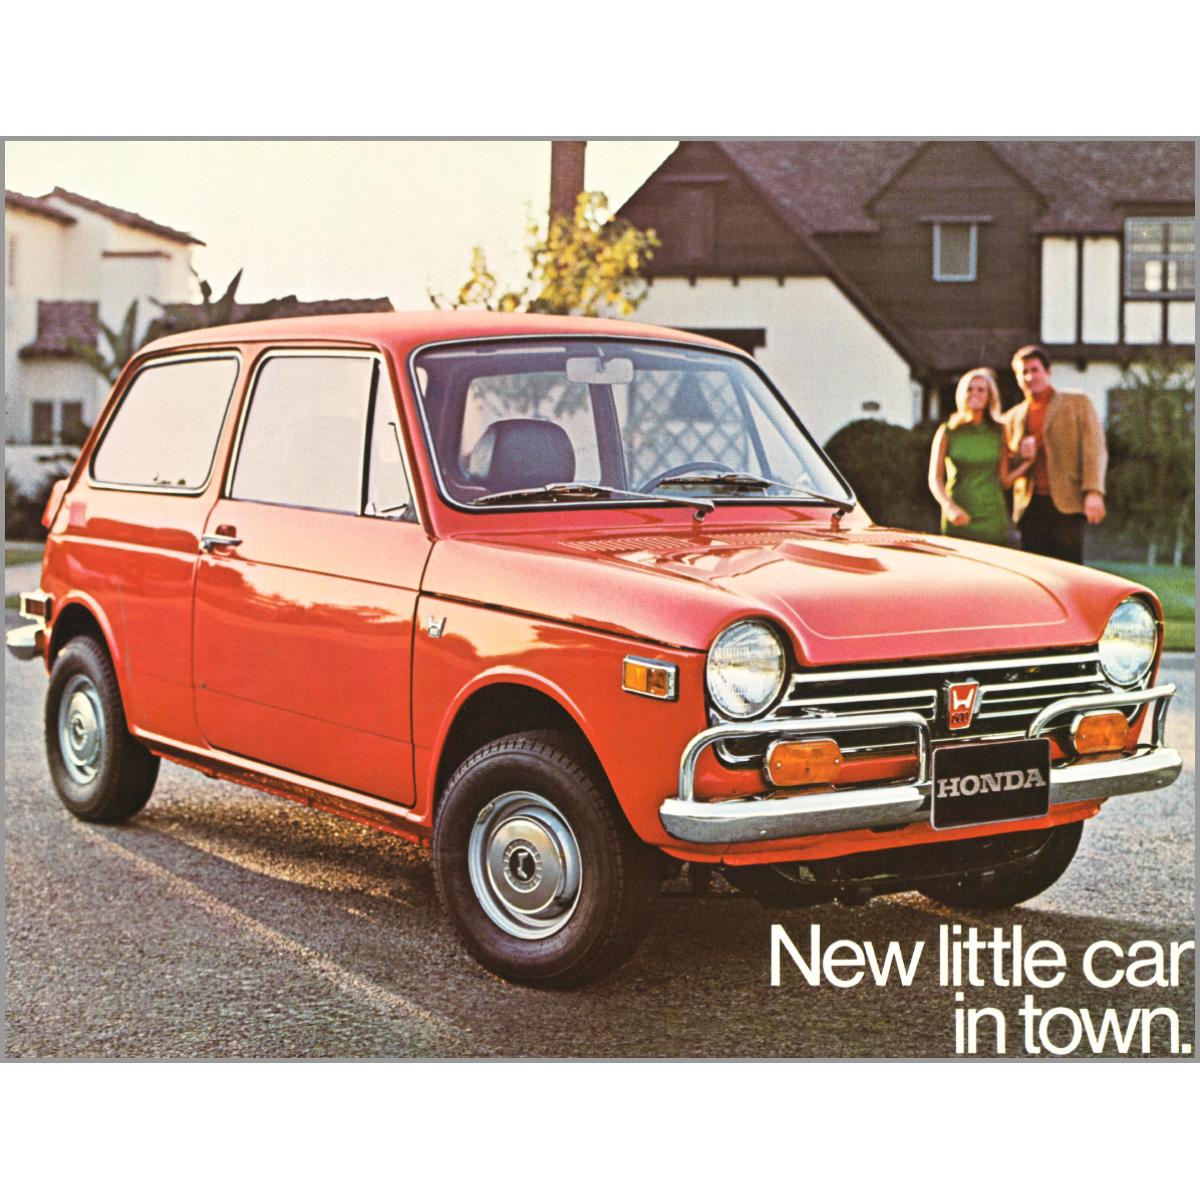 new little car.jpg